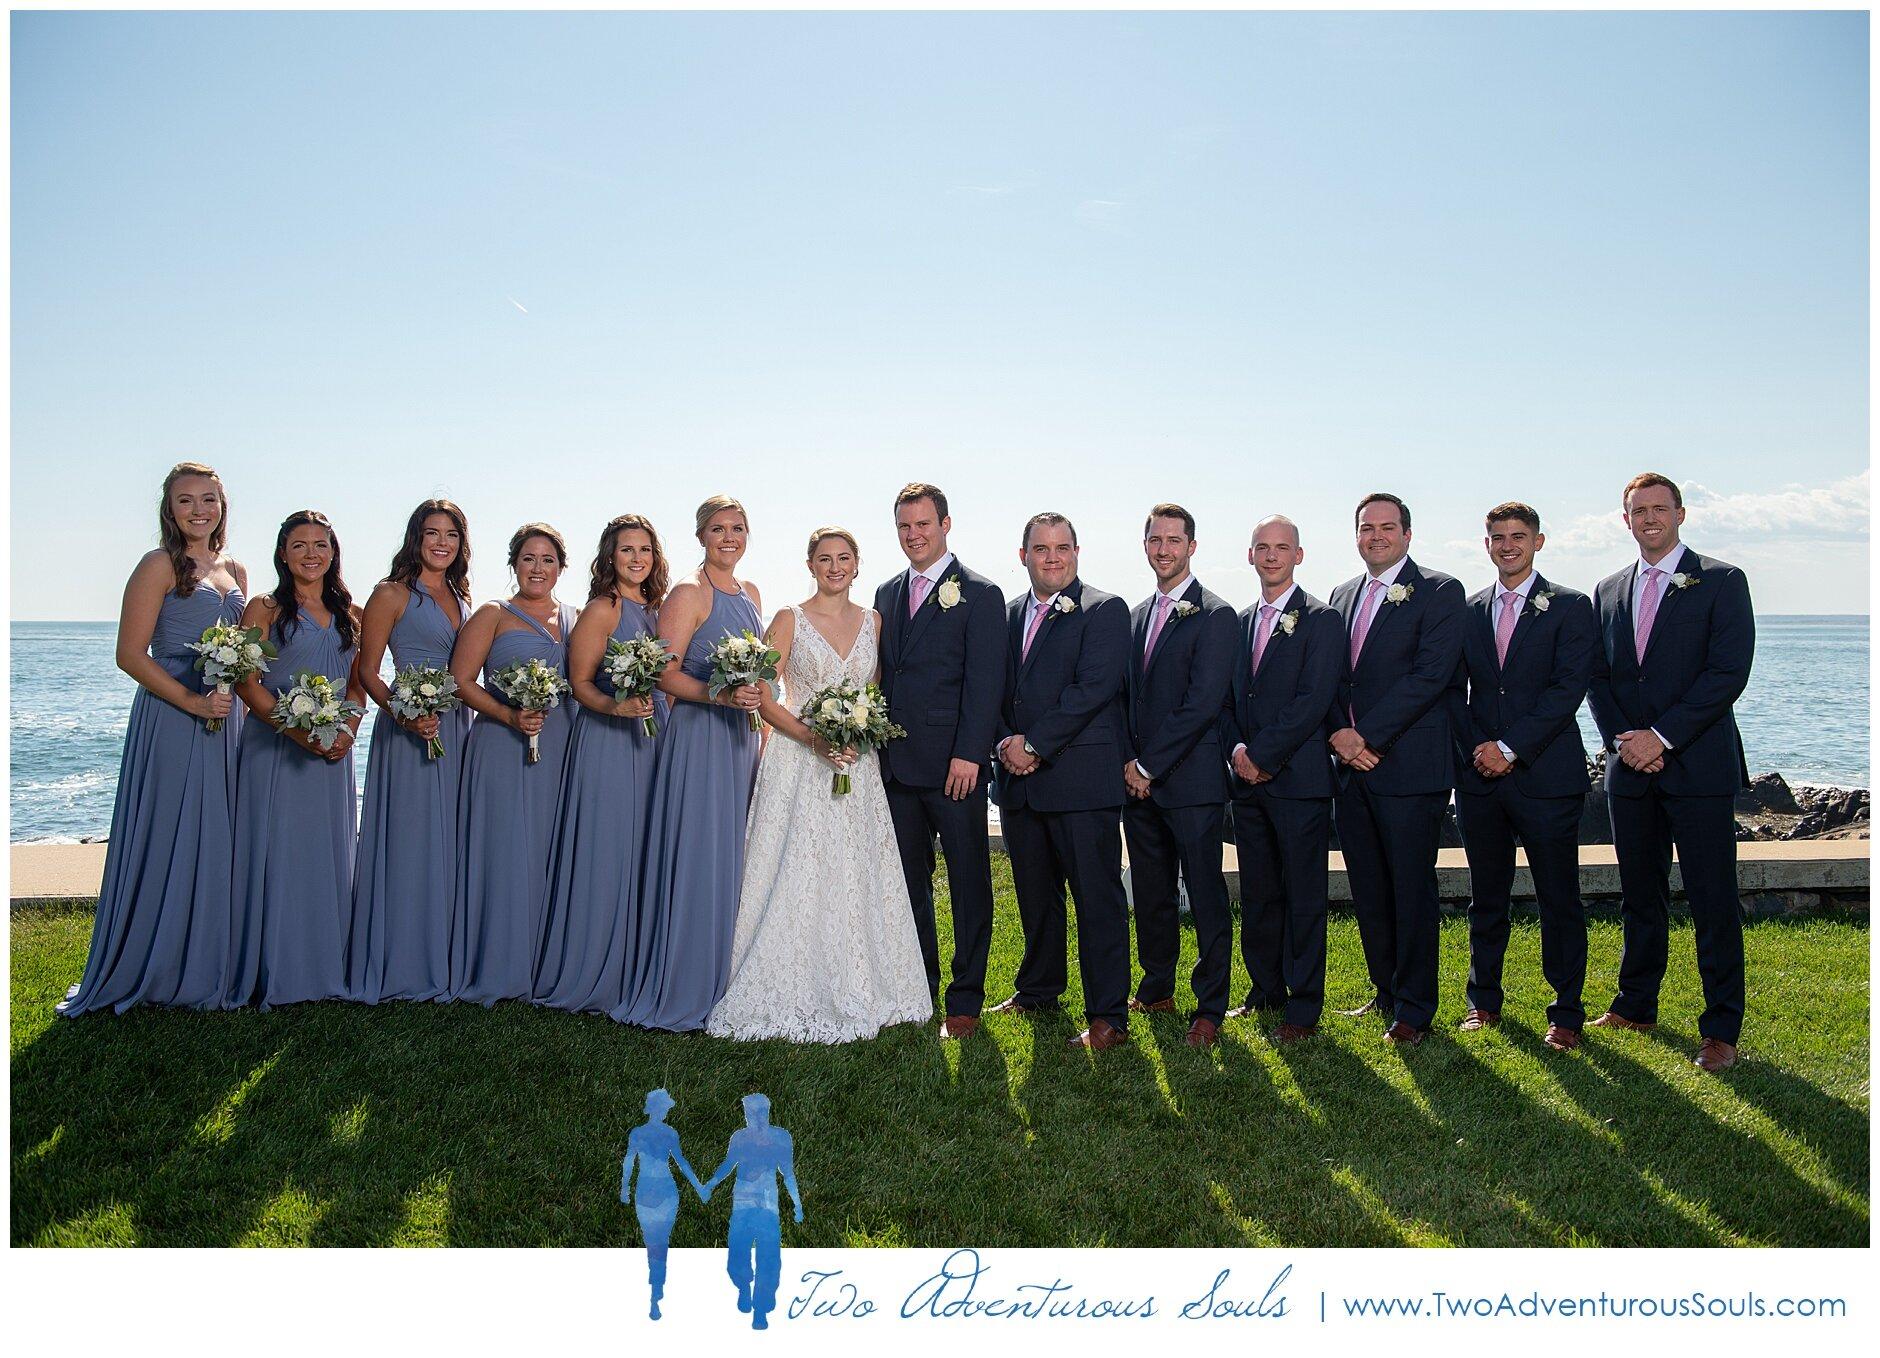 Breakwater Inn and Spa Wedding Photographers, Kennebunkport Wedding Photographers, Two Adventurous Souls- 092119_0023.jpg